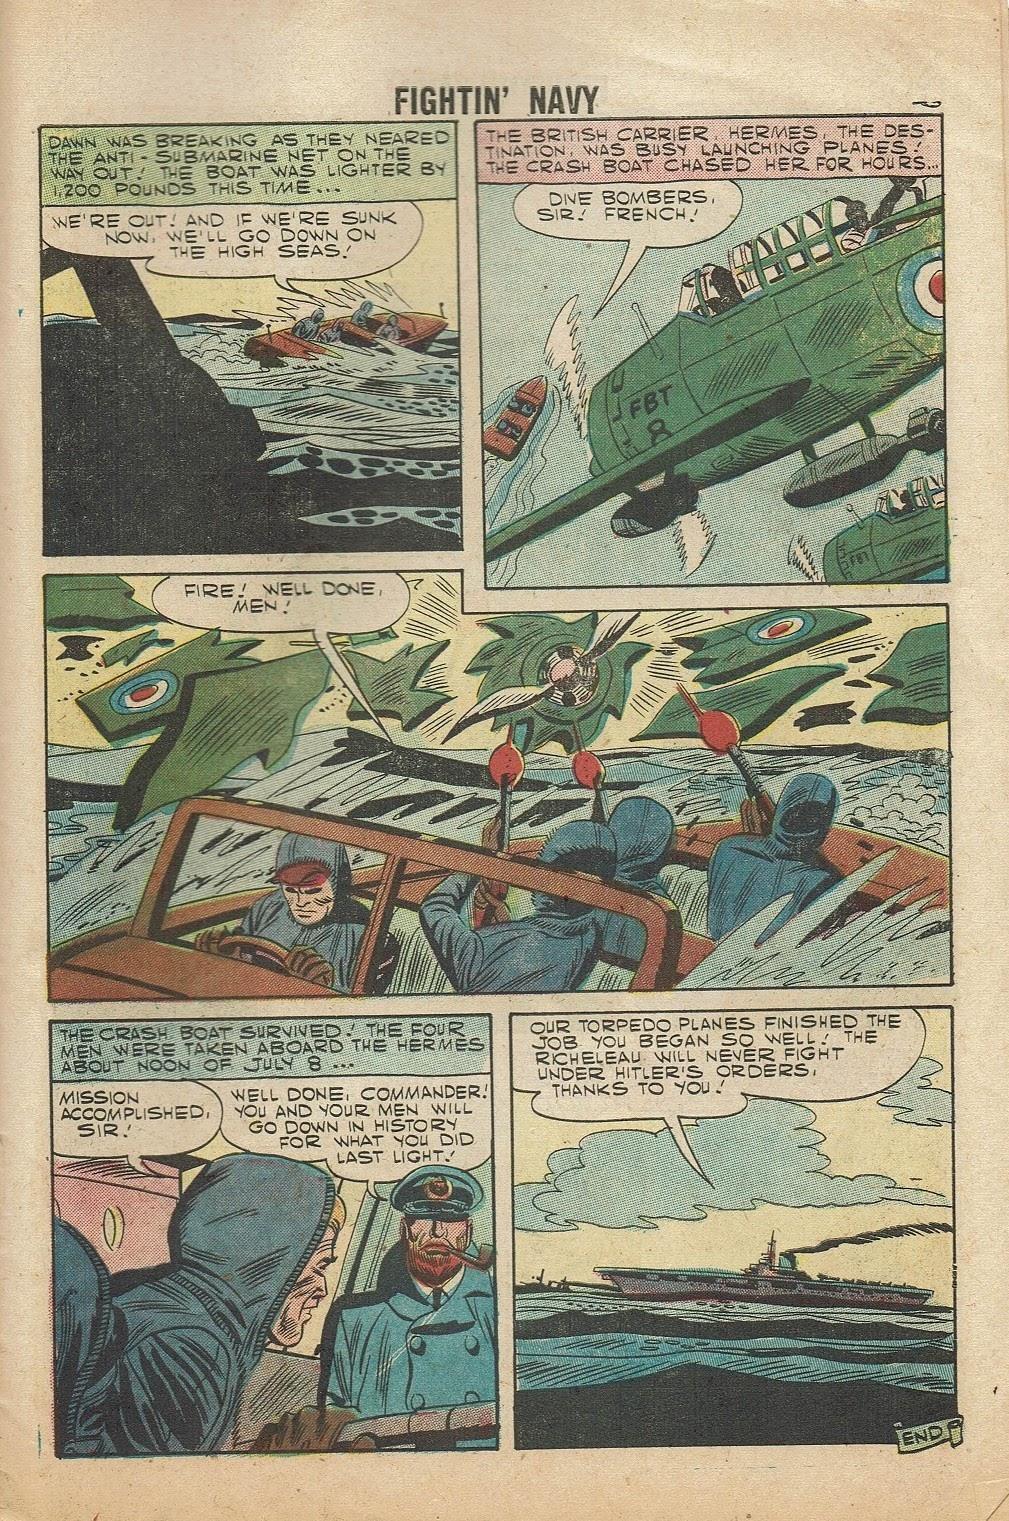 Read online Fightin' Navy comic -  Issue #81 - 27